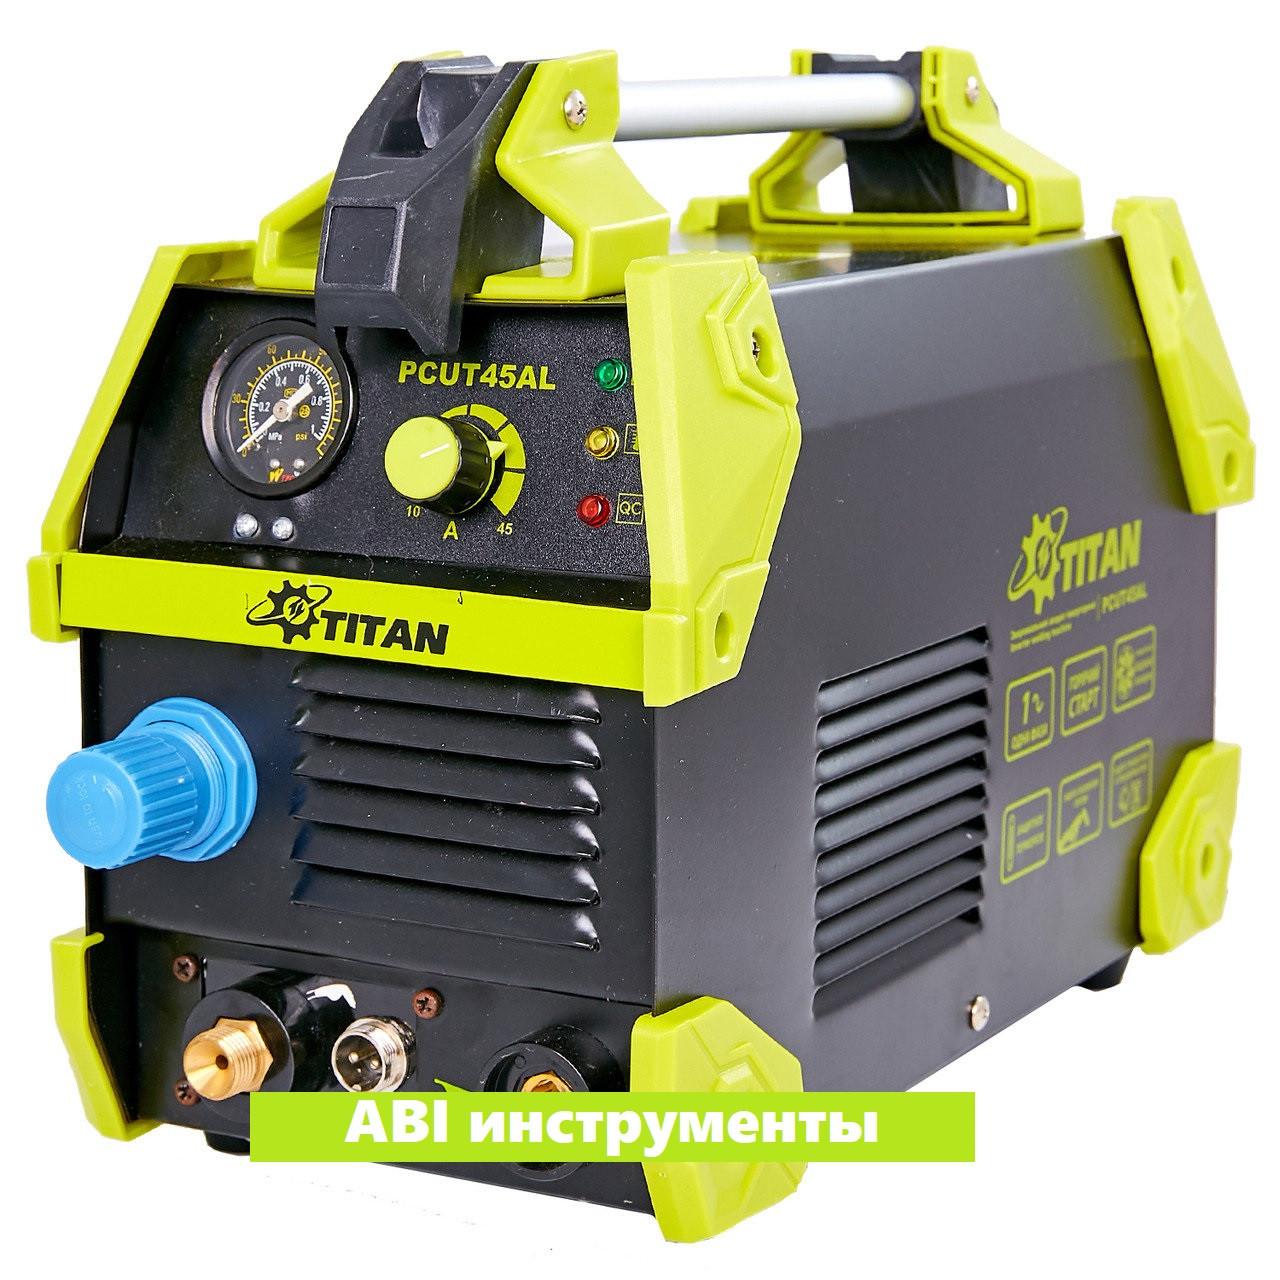 Аппарат плазменной резки Титан PCUT45AL (12 мм)